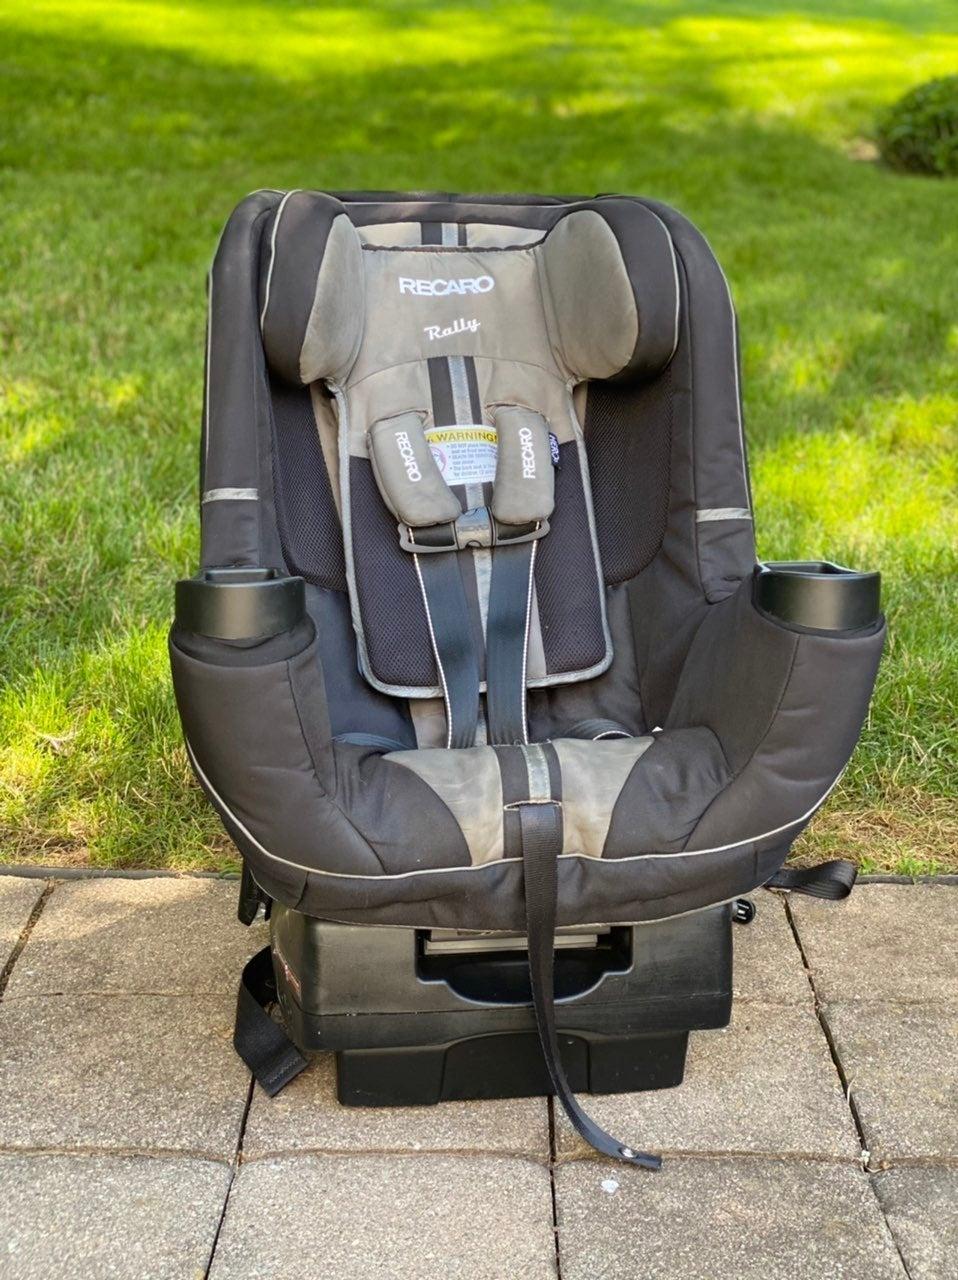 Recaro Rally car seat